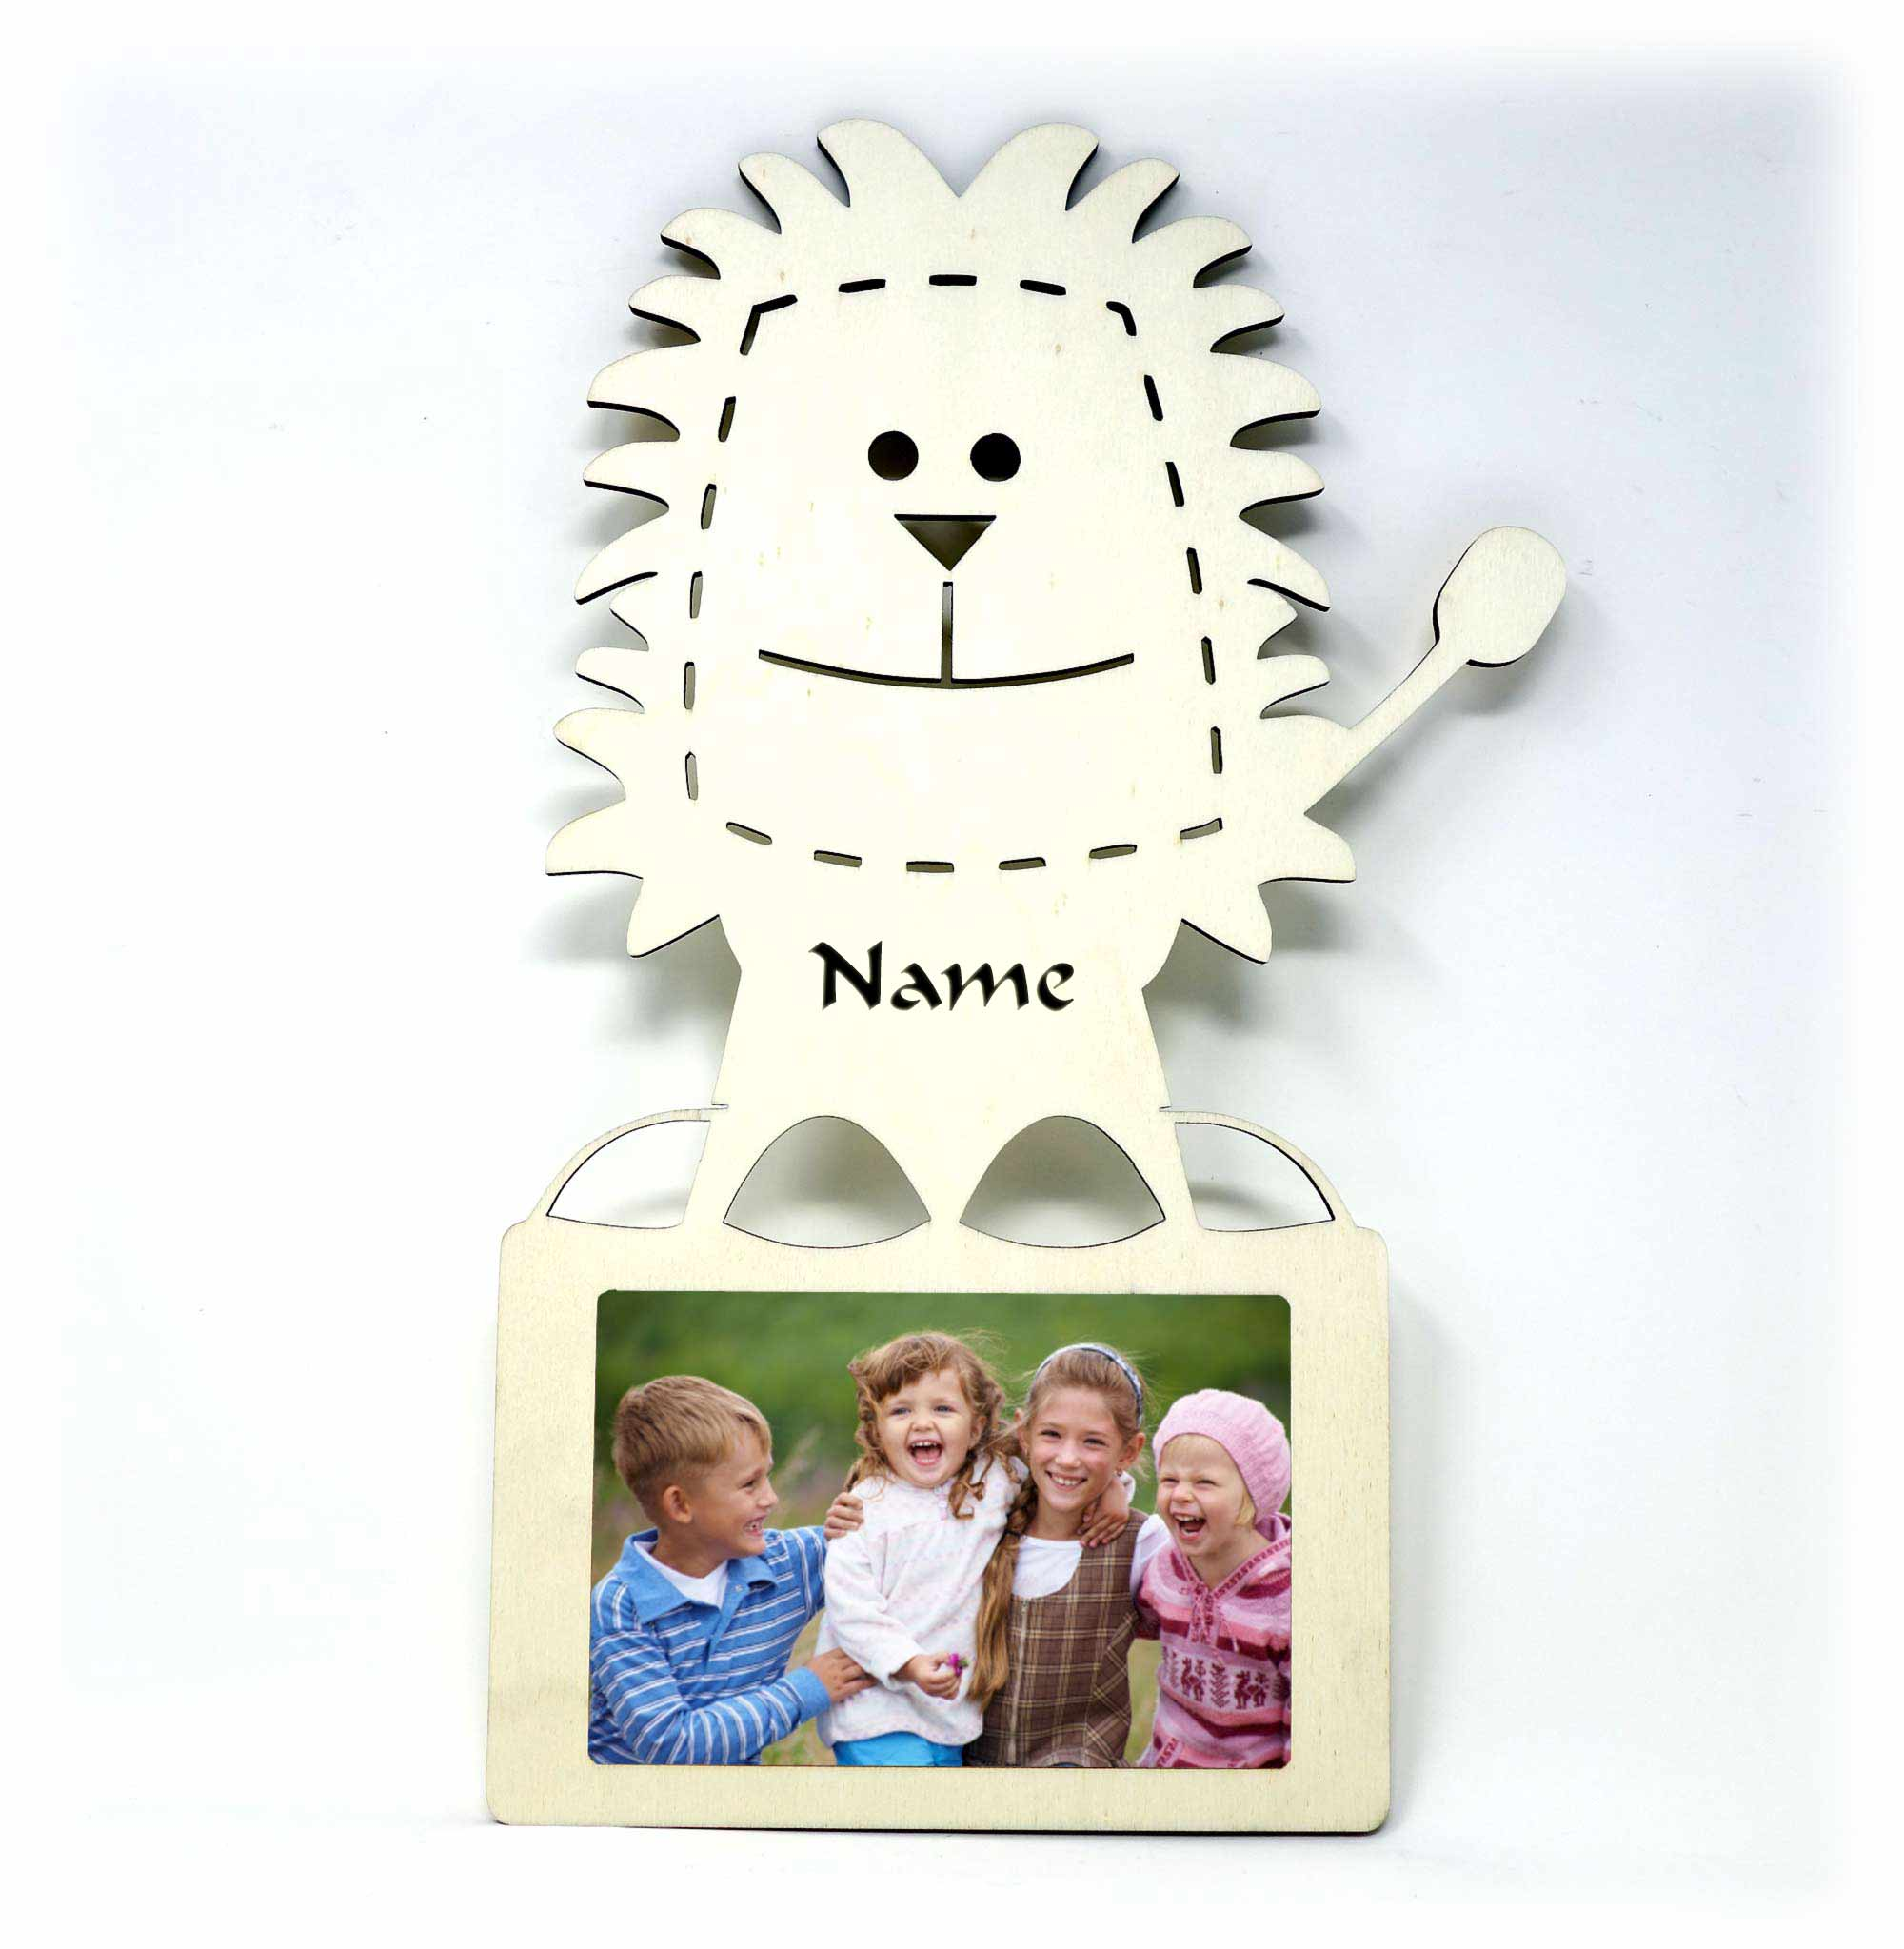 Geschenkidee Löwe Bilderrahmen individuell mit Namen personalisiert ...